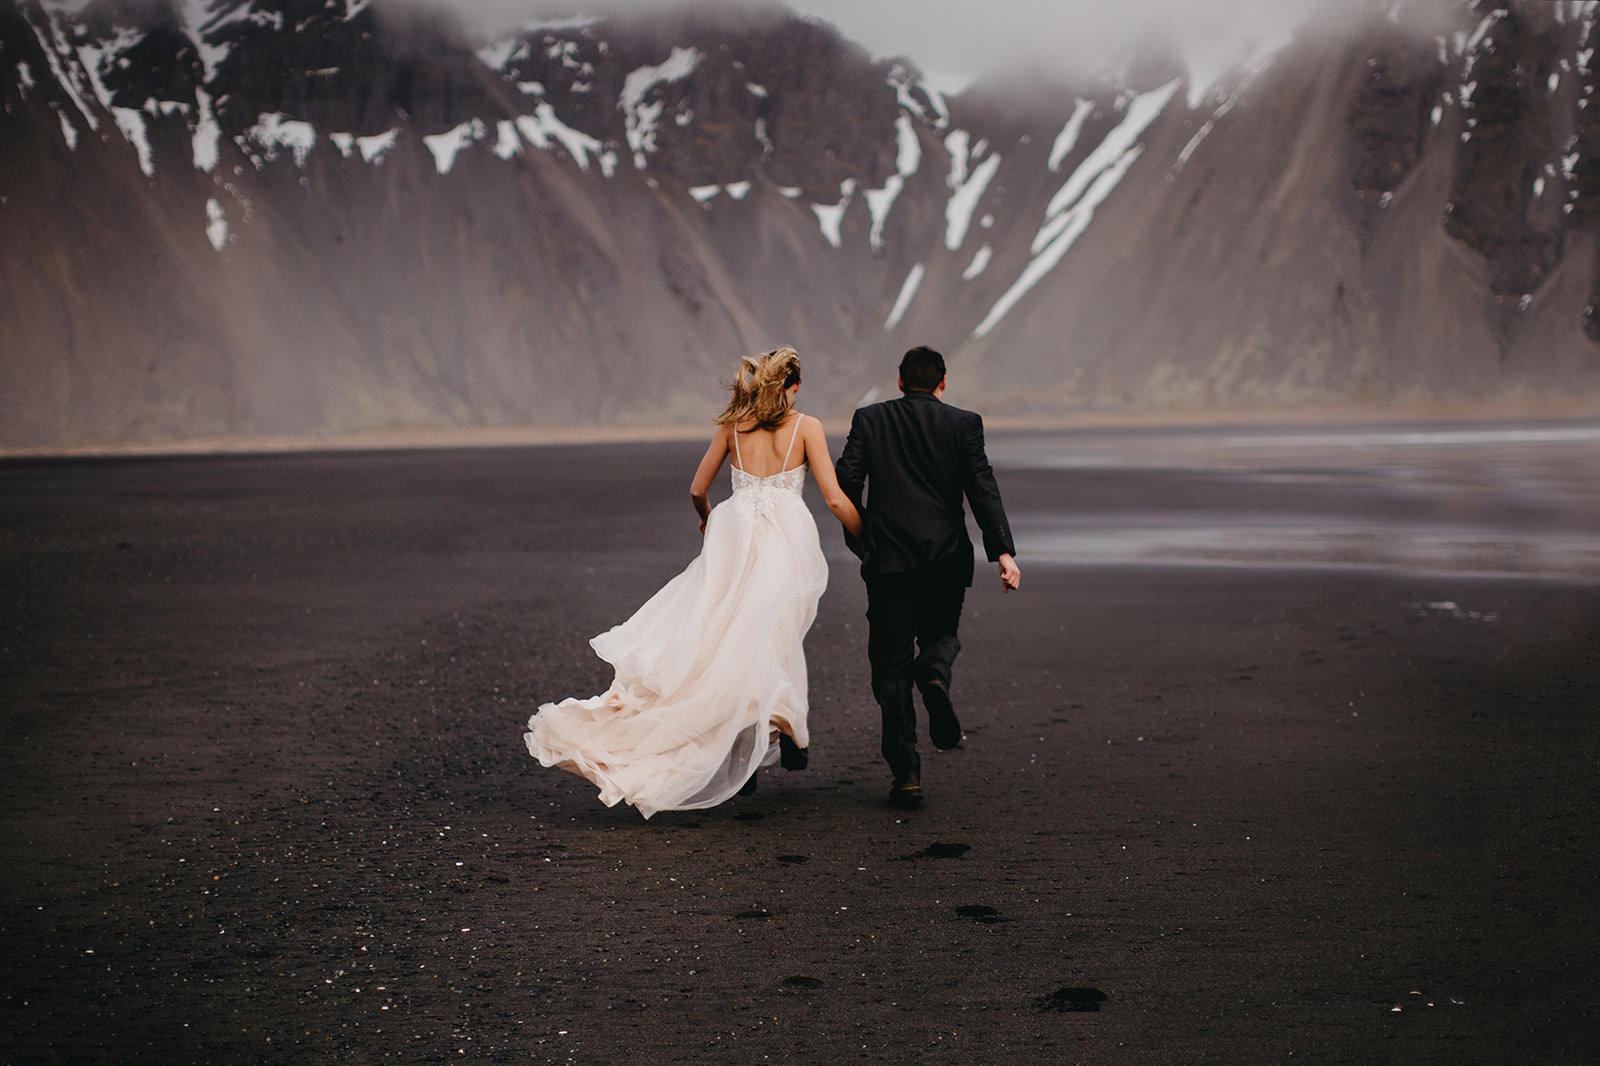 Icelandic Iceland Elopement Wedding Elope Photographer Eloping Reykjavík Vik Black Sand Beach Jökulsárlón Skogafoss Waterfall Vestrahorn Mountain Liz Osban Photography Destination 38.jpg